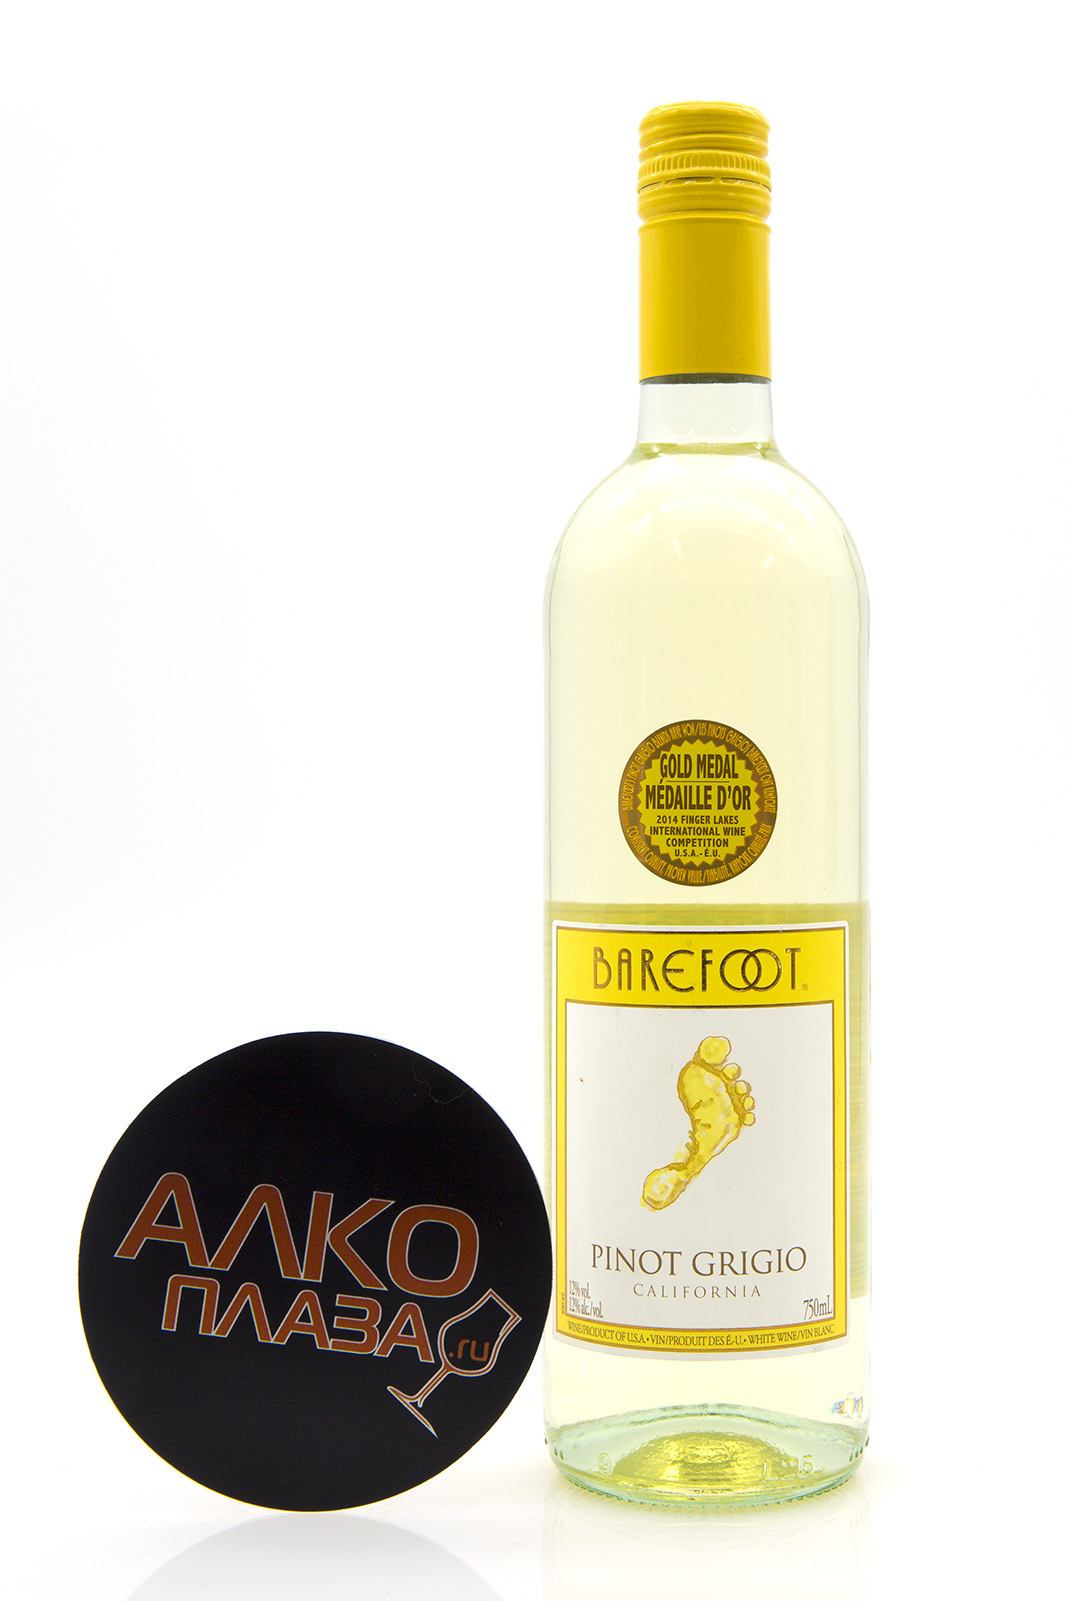 Barefoot Pinot Grigio California американское вино Берфут Пино Гриджио Калифорния